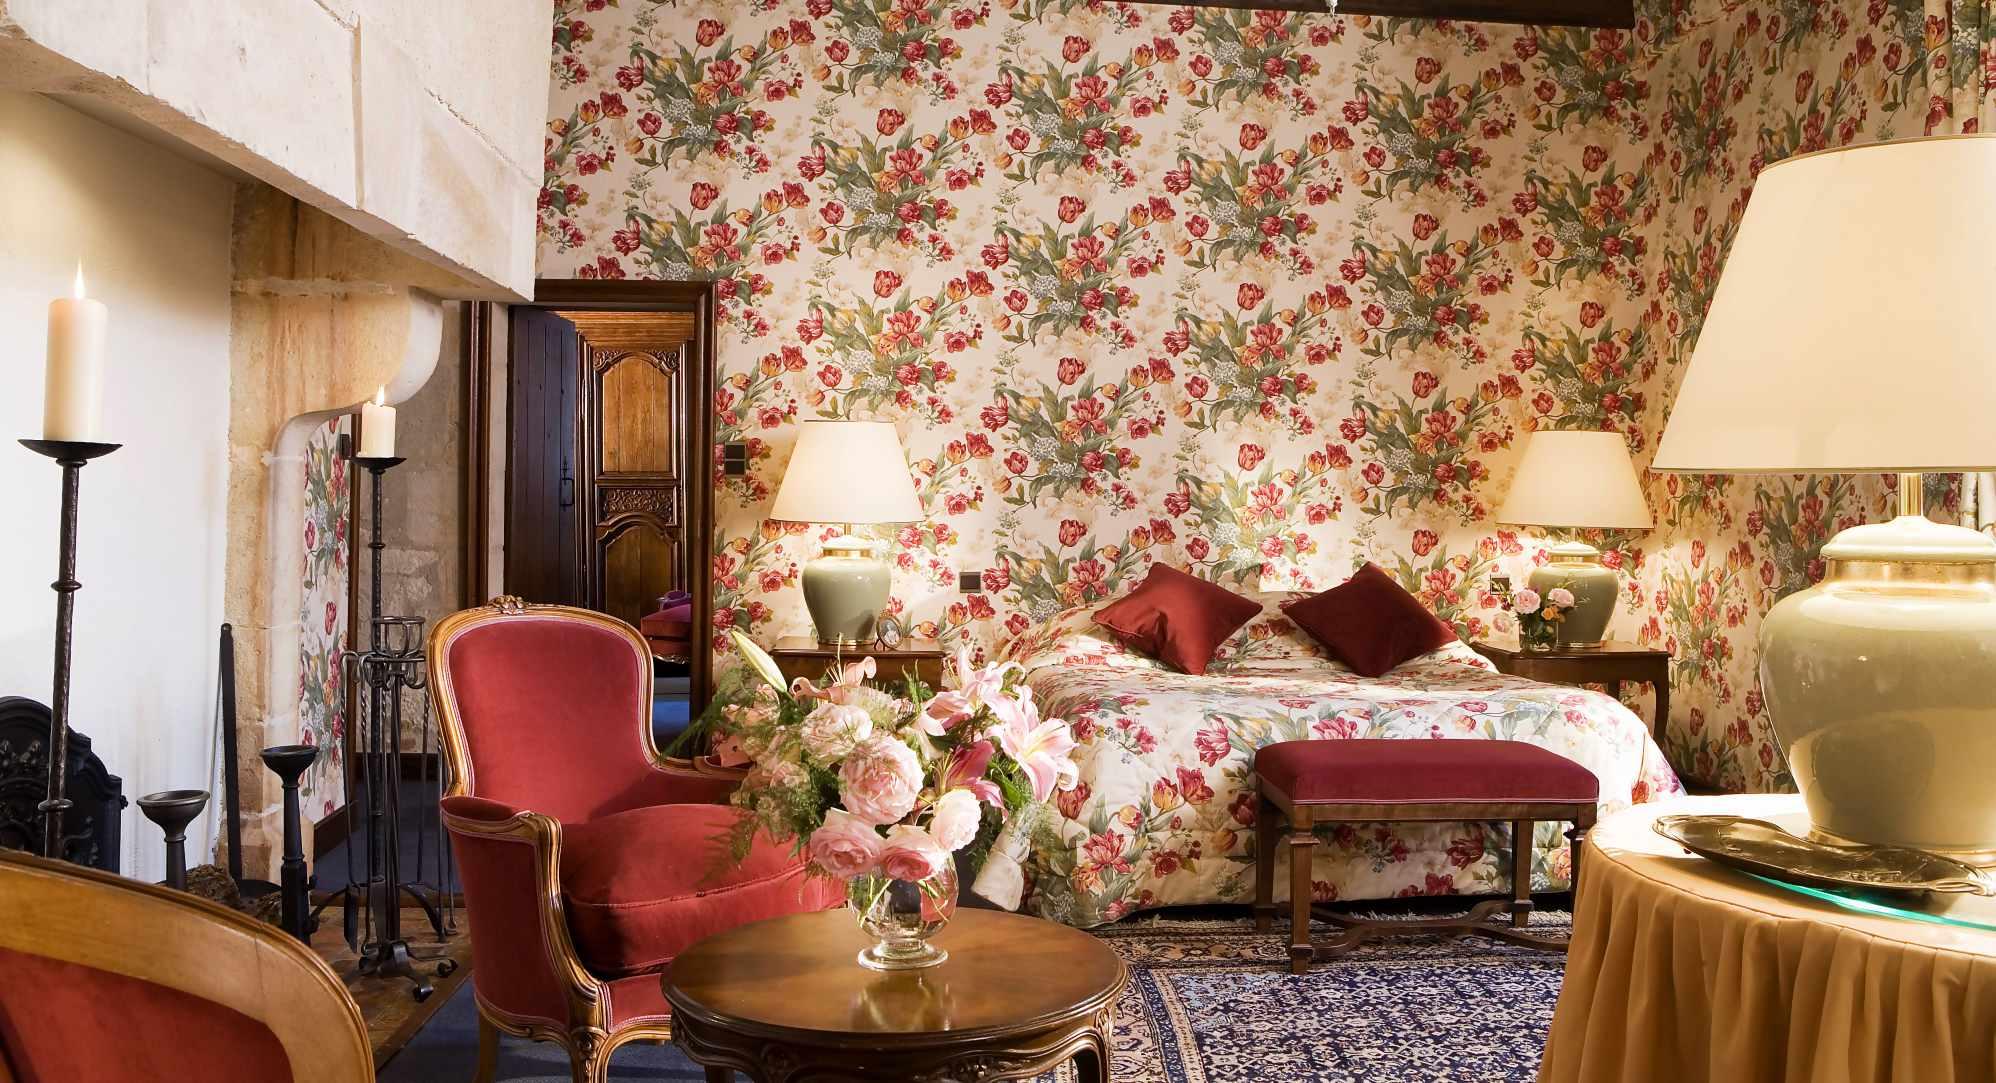 Suite Chateau de Gilly Bourgogne